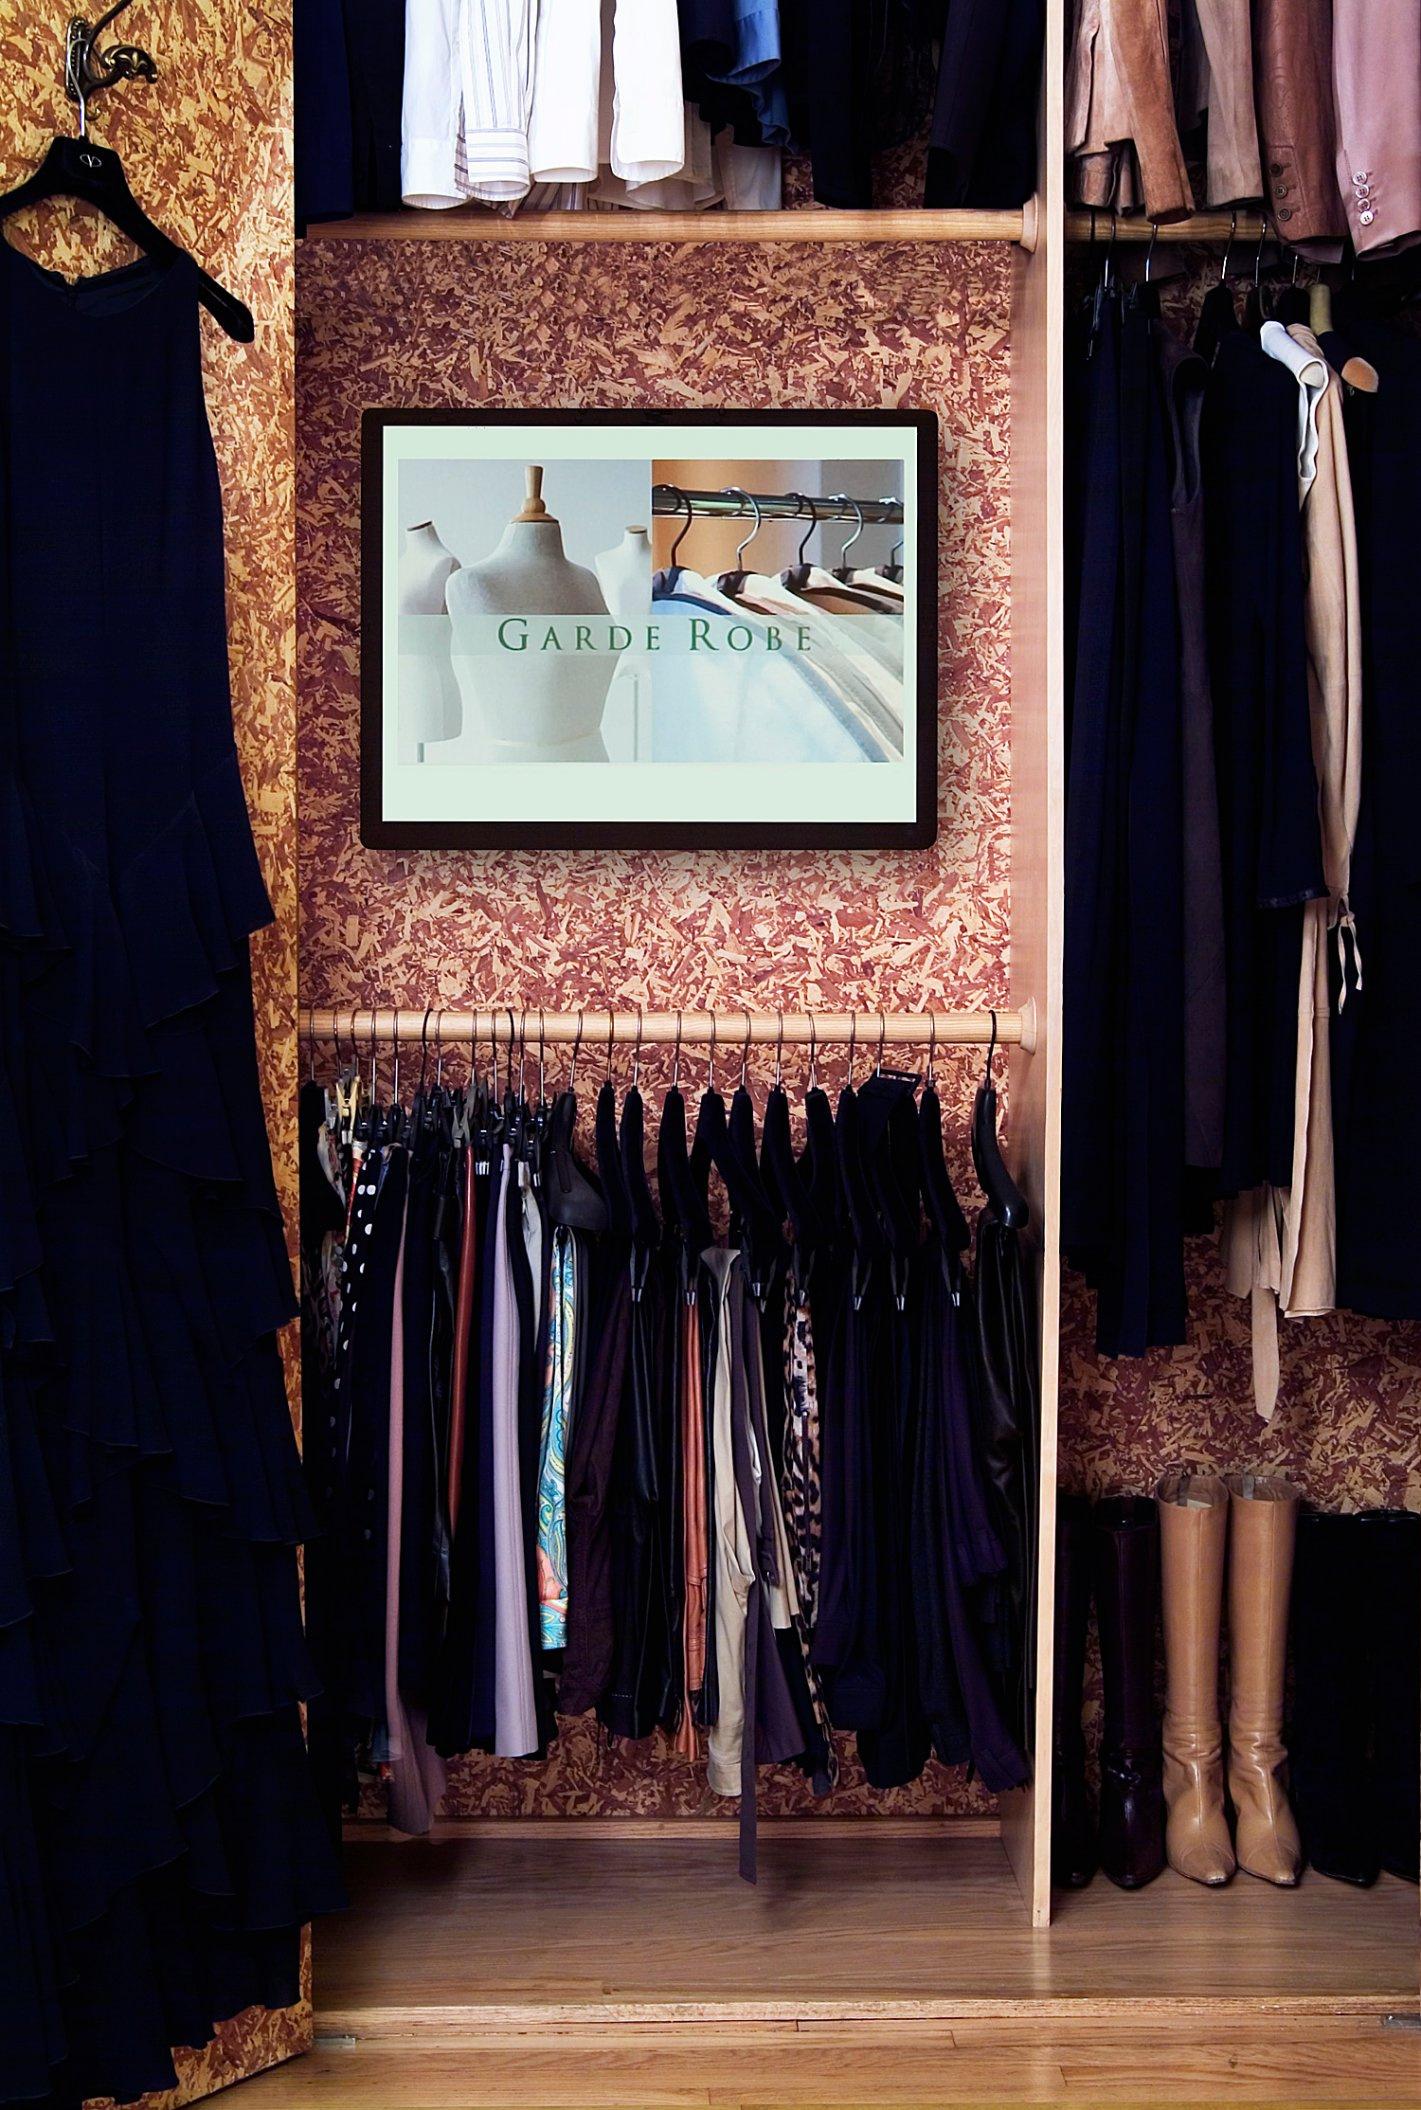 Garde Robe Wardrobe Management Service.. | superyachts.com